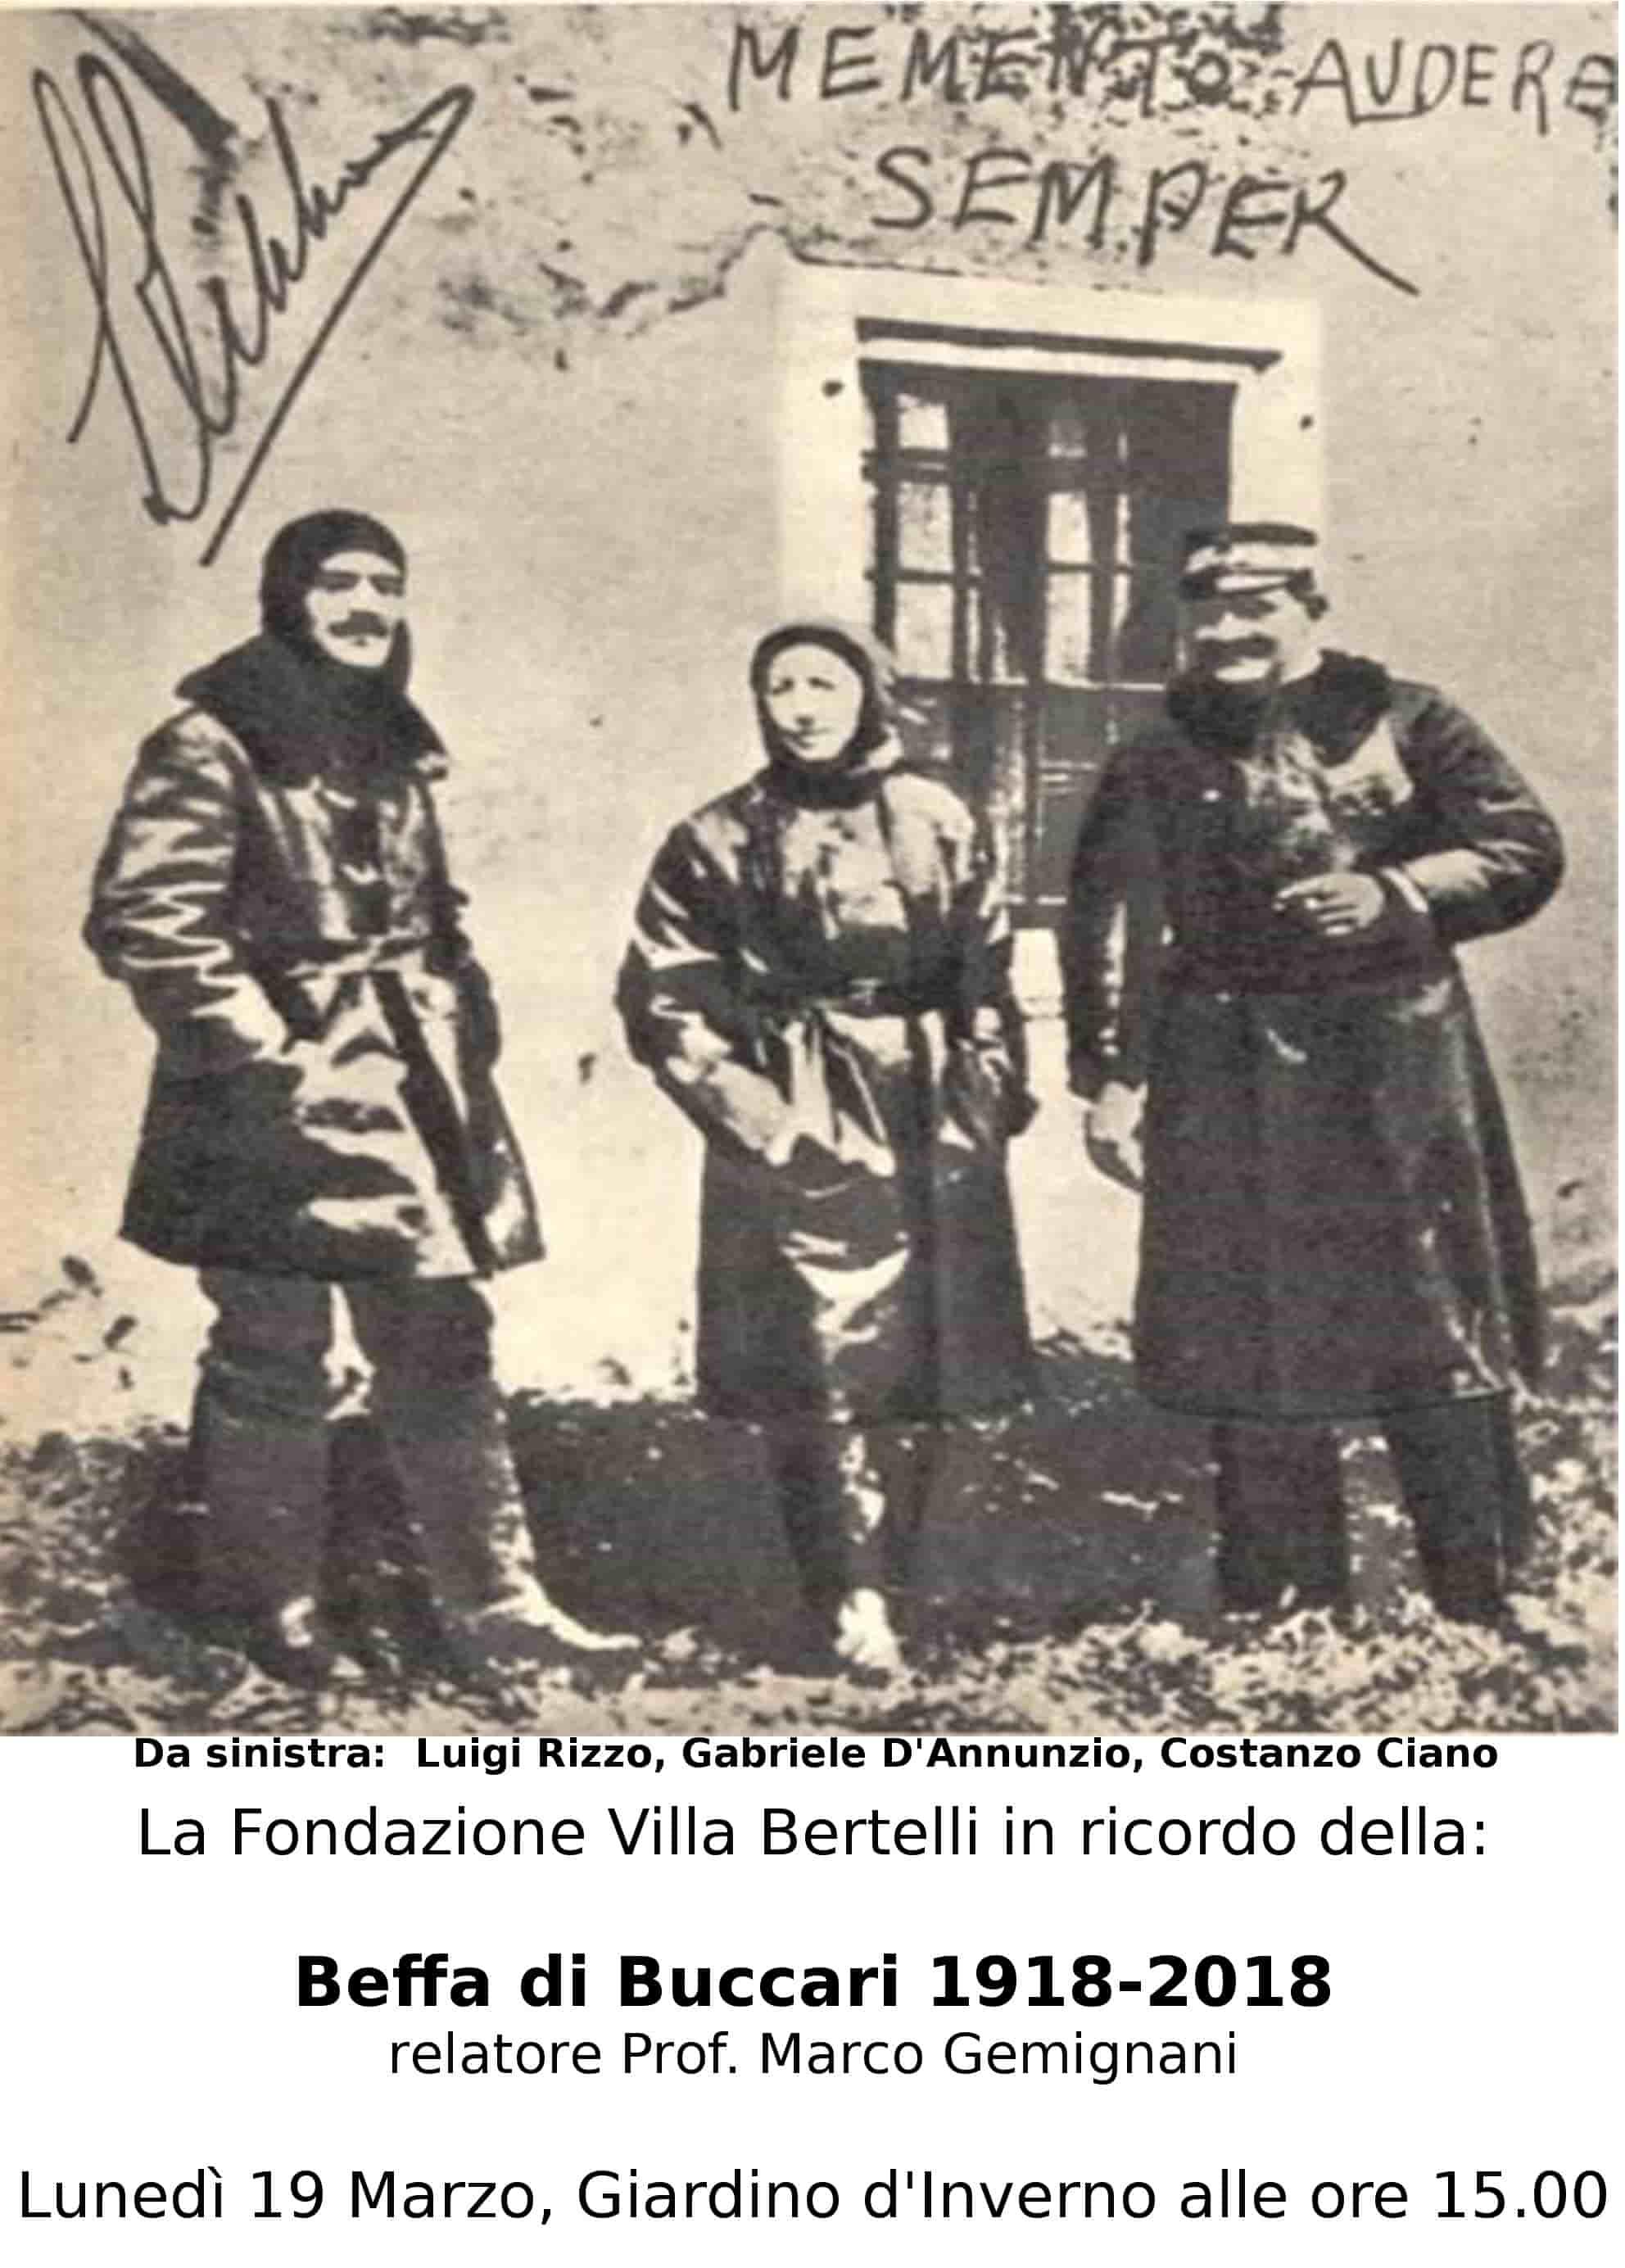 La Beffa di Buccari 1918-2018